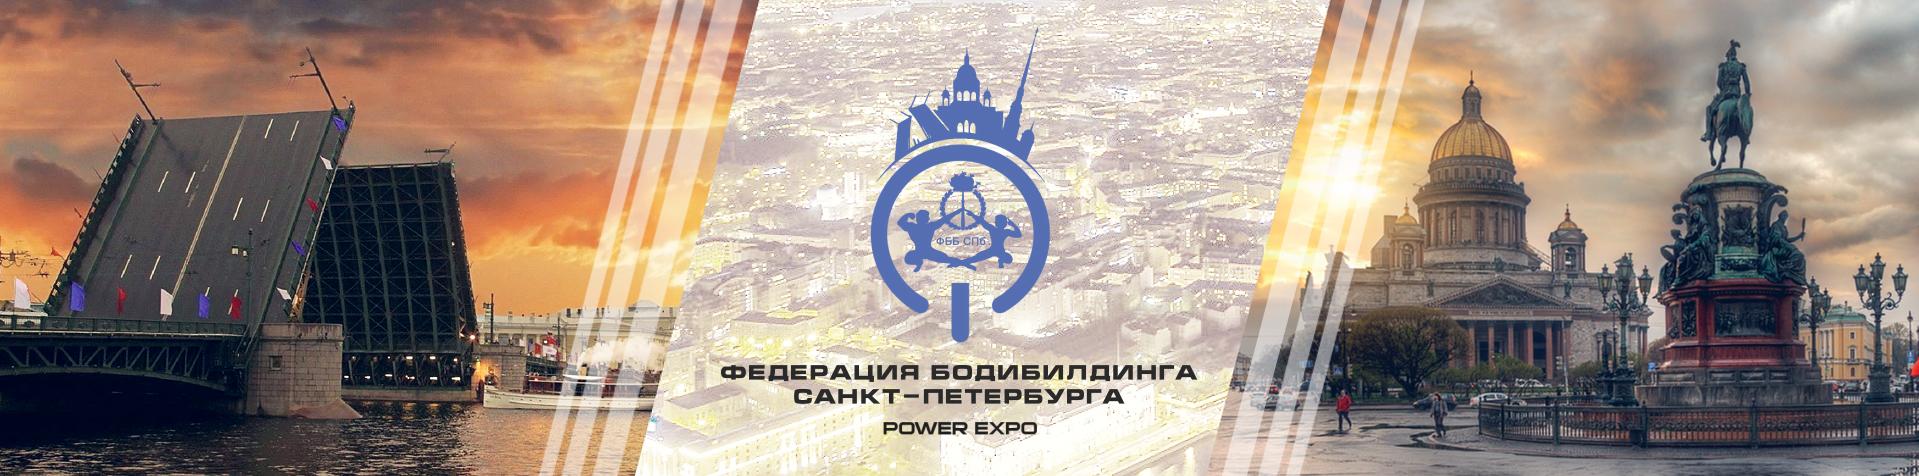 Федерация бодибилдинга Санкт-Петербурга